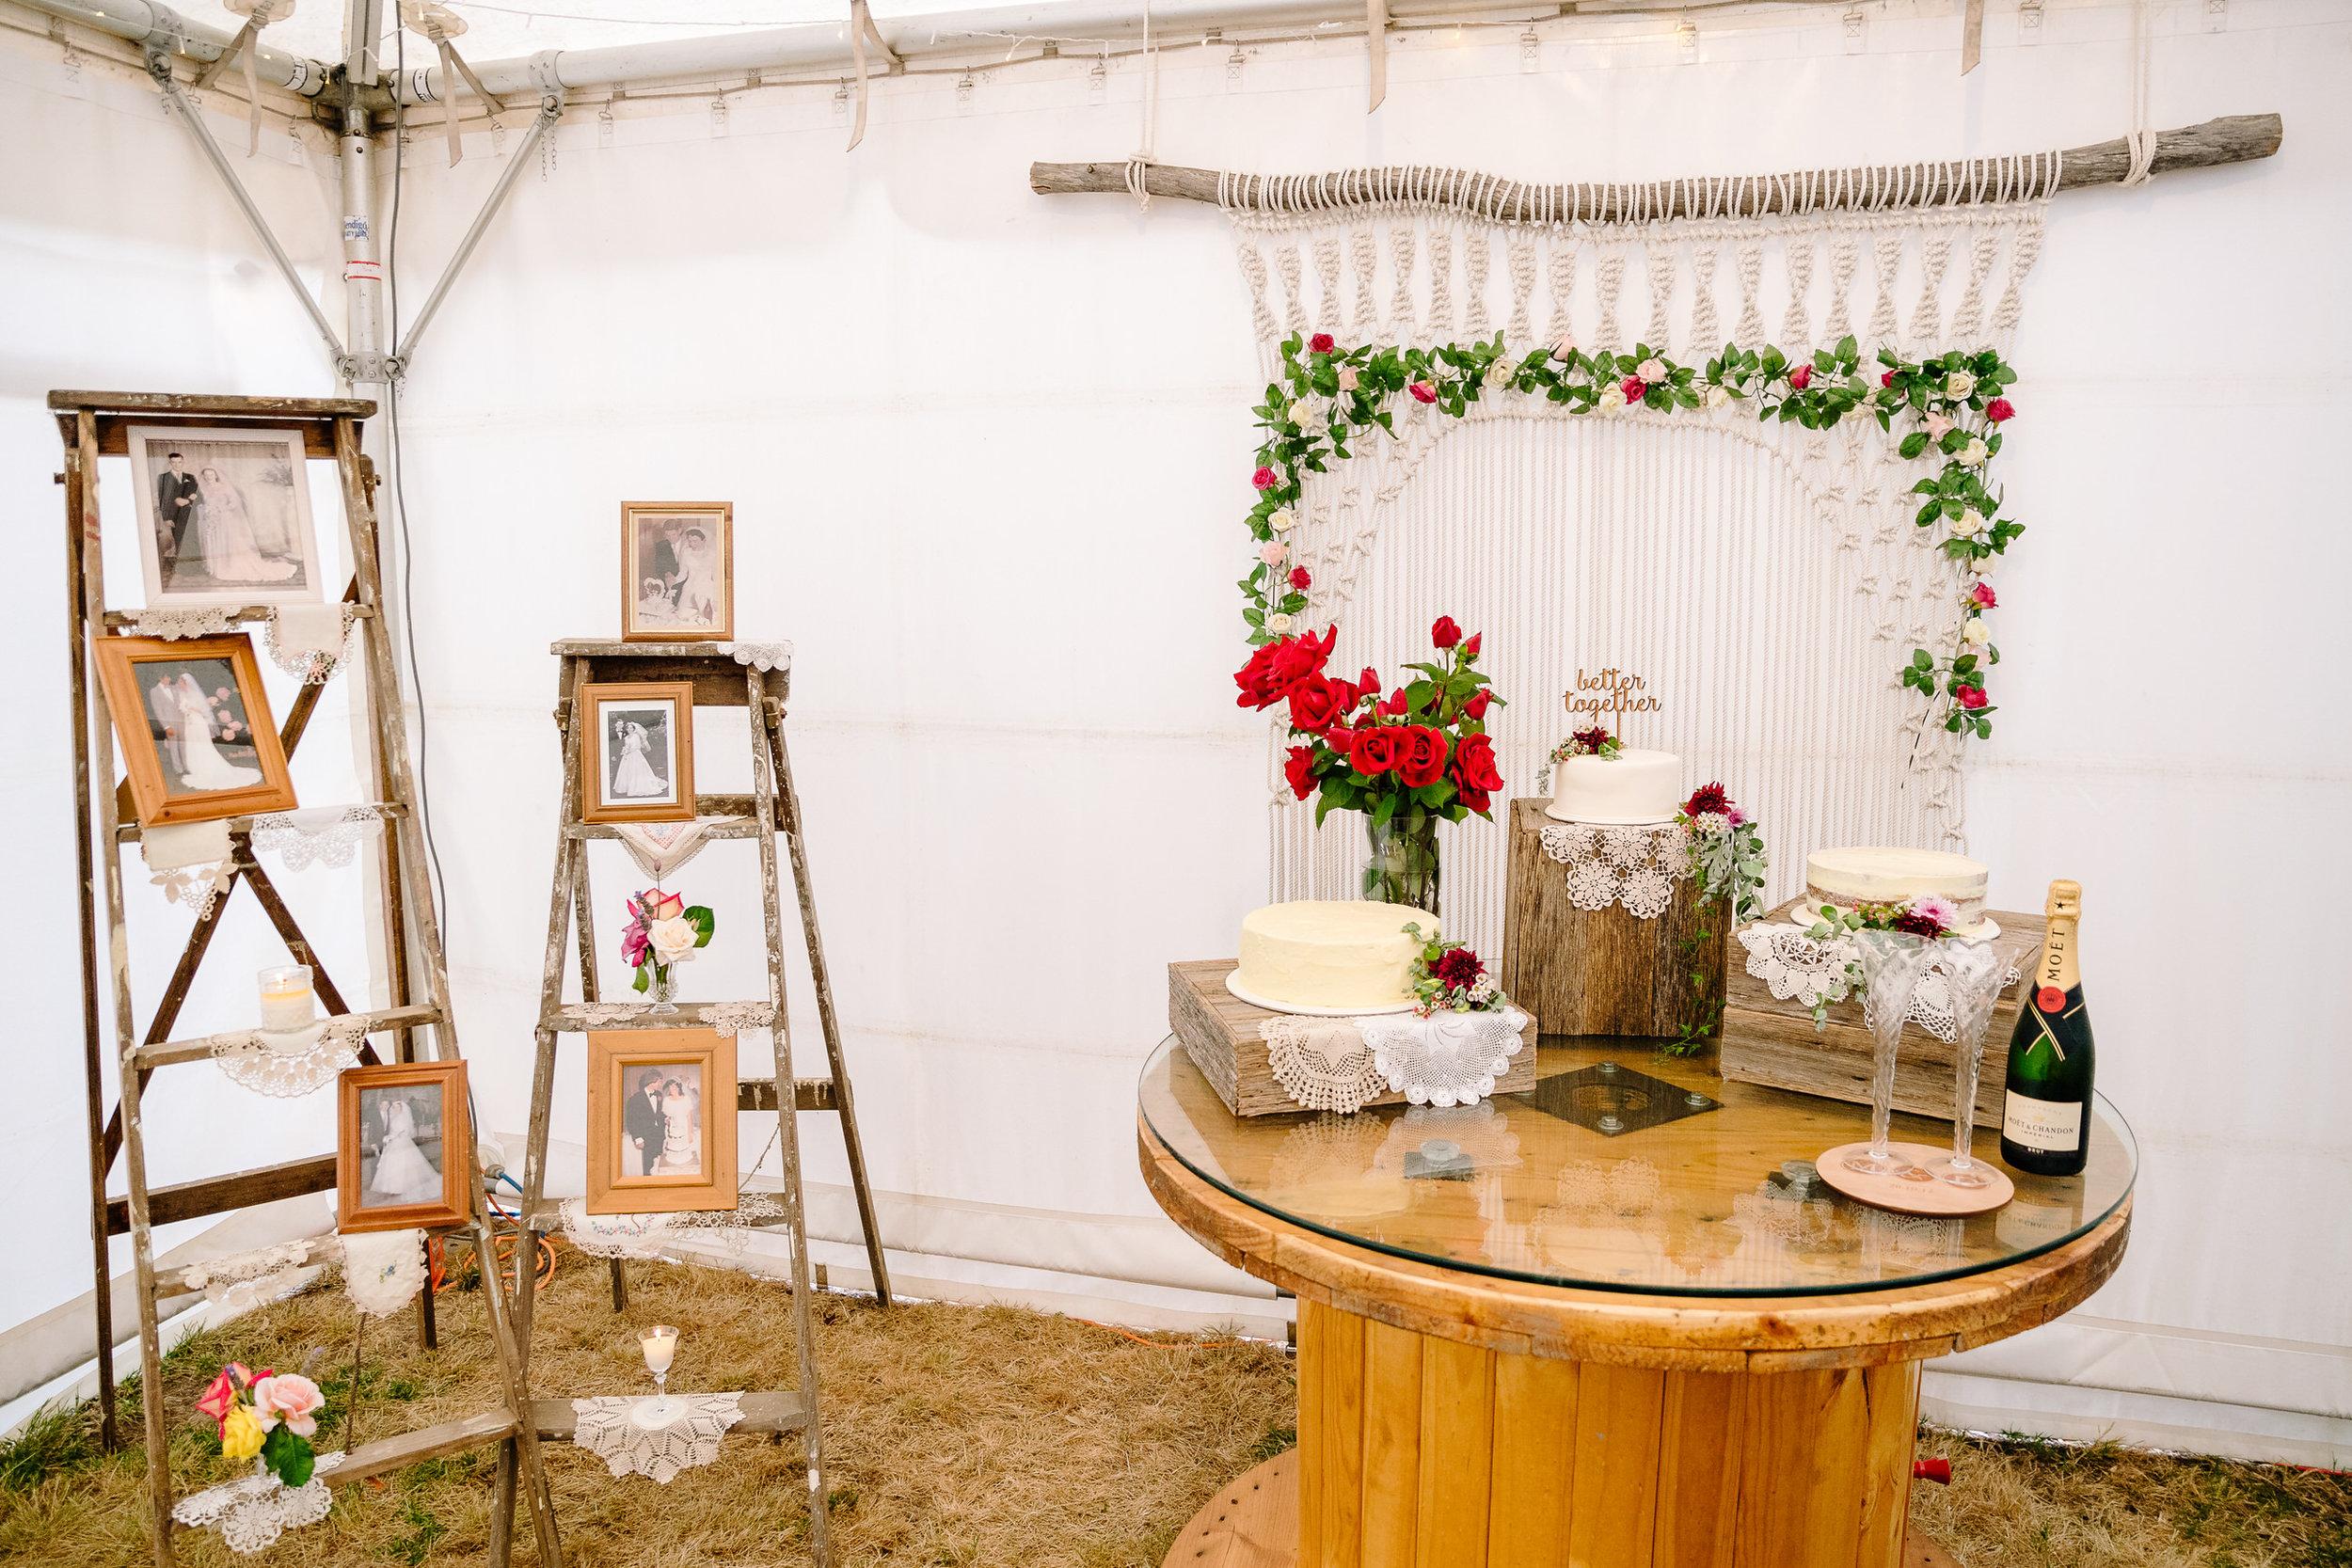 Justin_And_Jim_Photography_Backyard_Wedding218.JPG